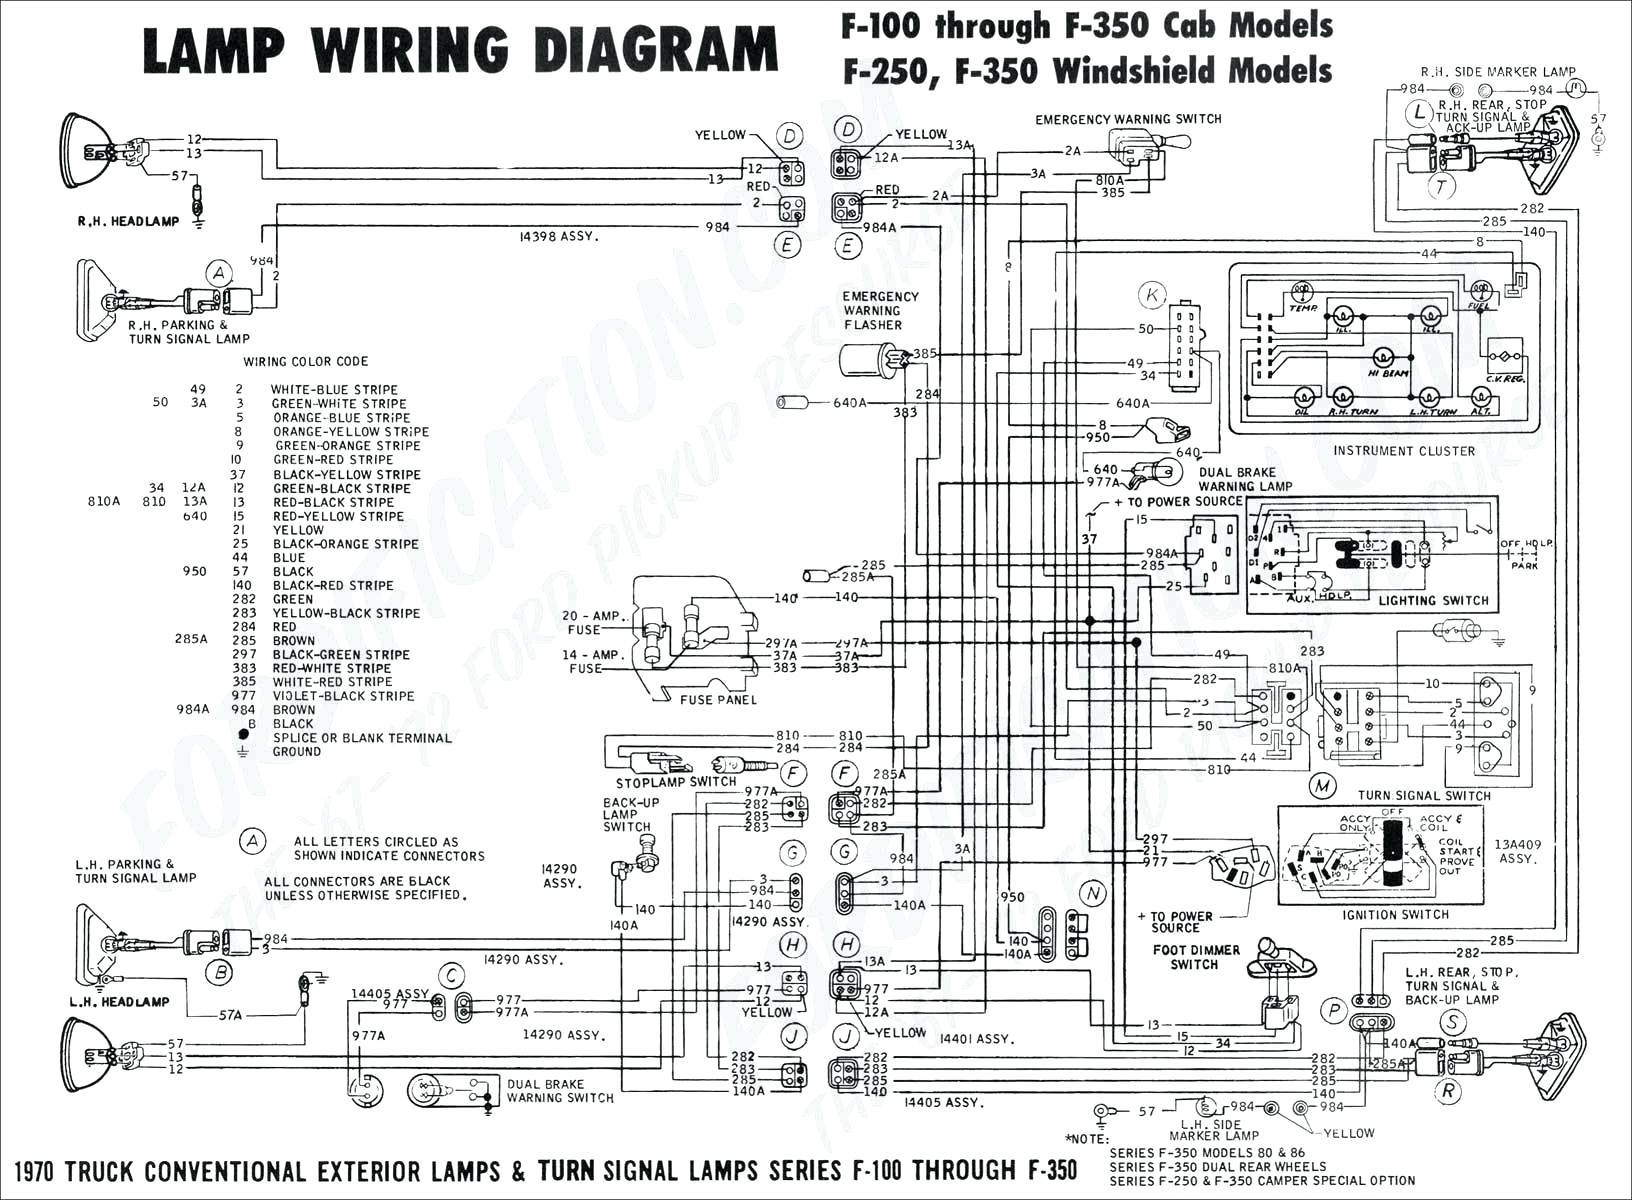 Garmin 740s Wiring Diagram